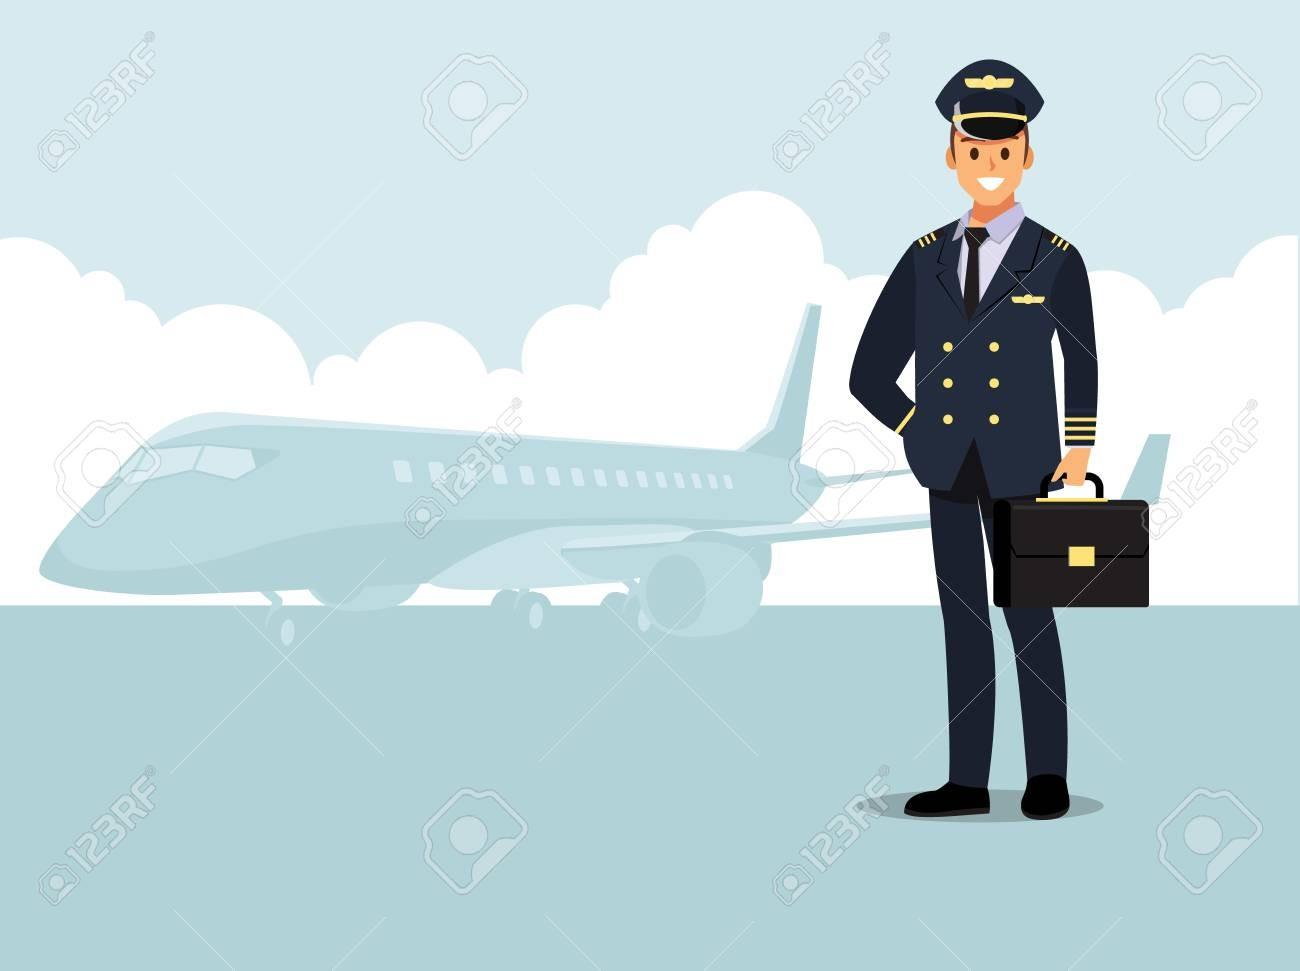 Within Clip Art Airplane Pilot Clipart Plane Captain 9.